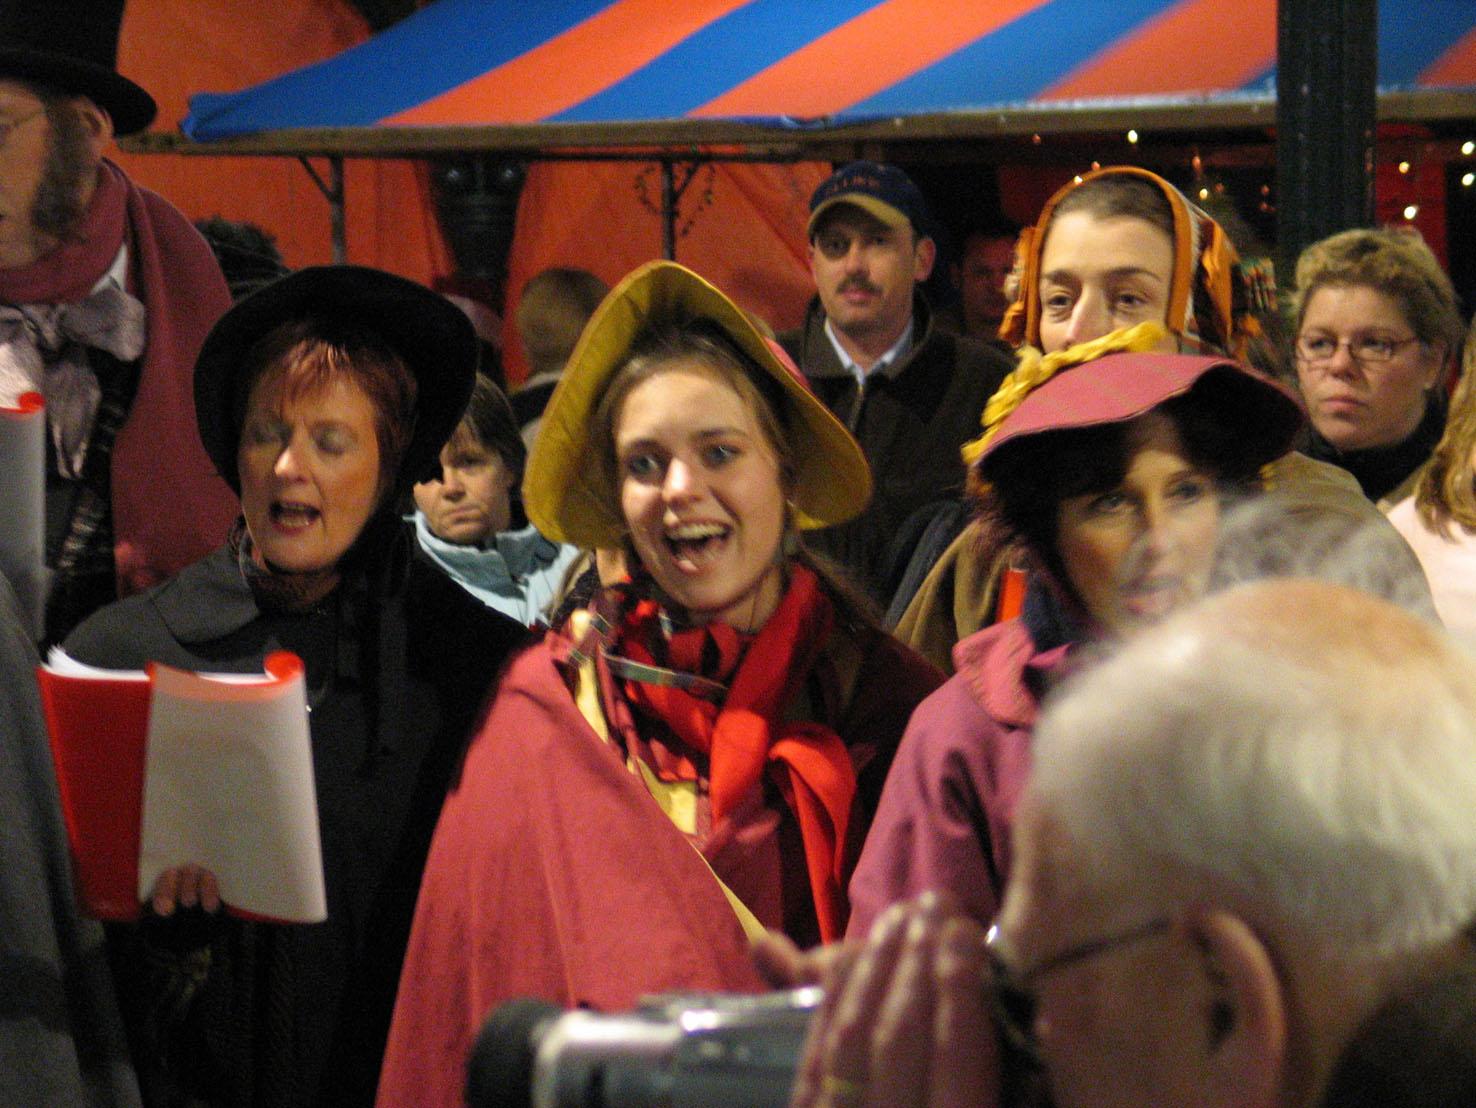 114 - Kerstmarkt Helmond 2003.jpg